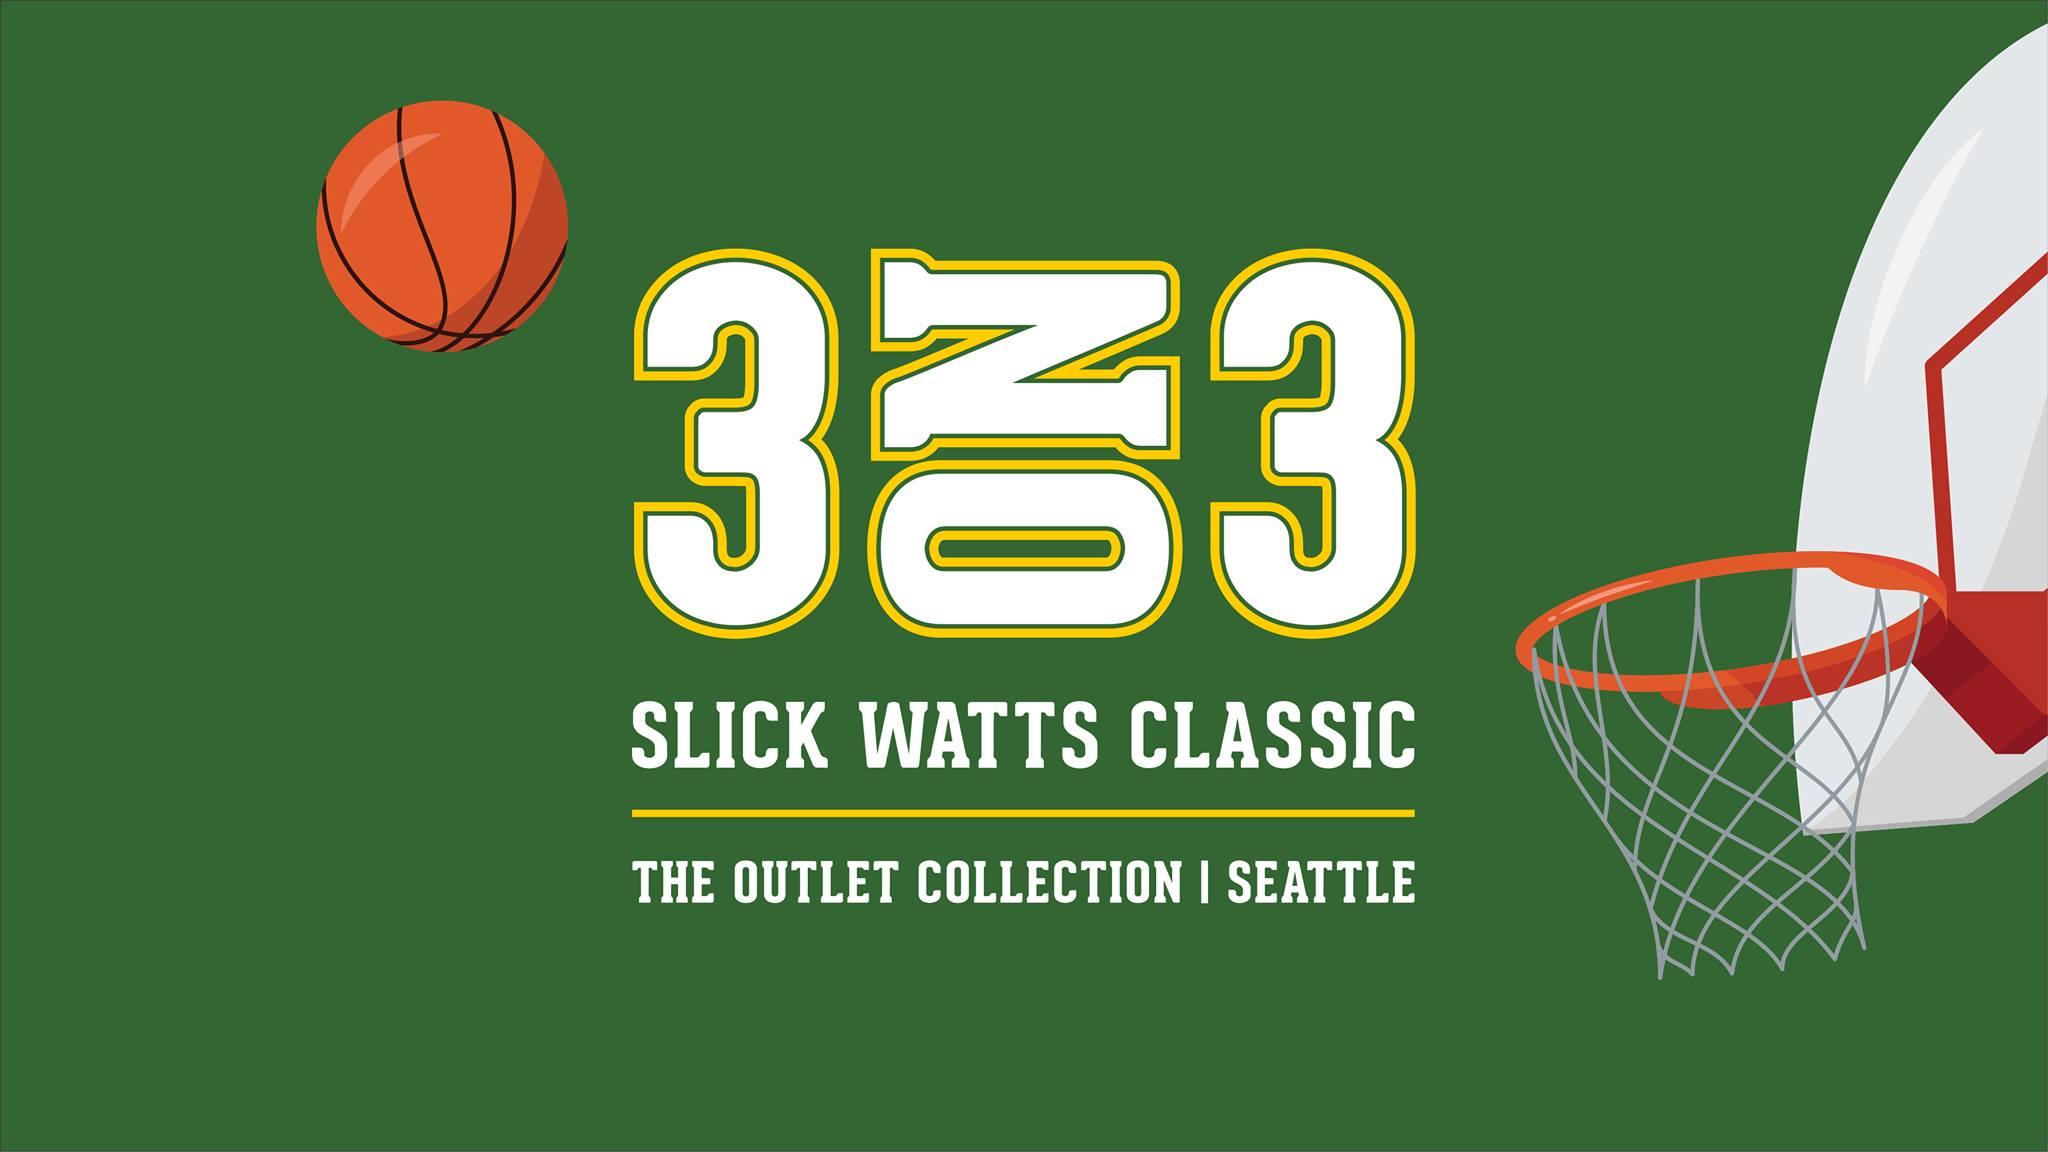 3on3 Slick Watts Classic, Slick Watts, Slick Watts Classic, 3on3 Tournament